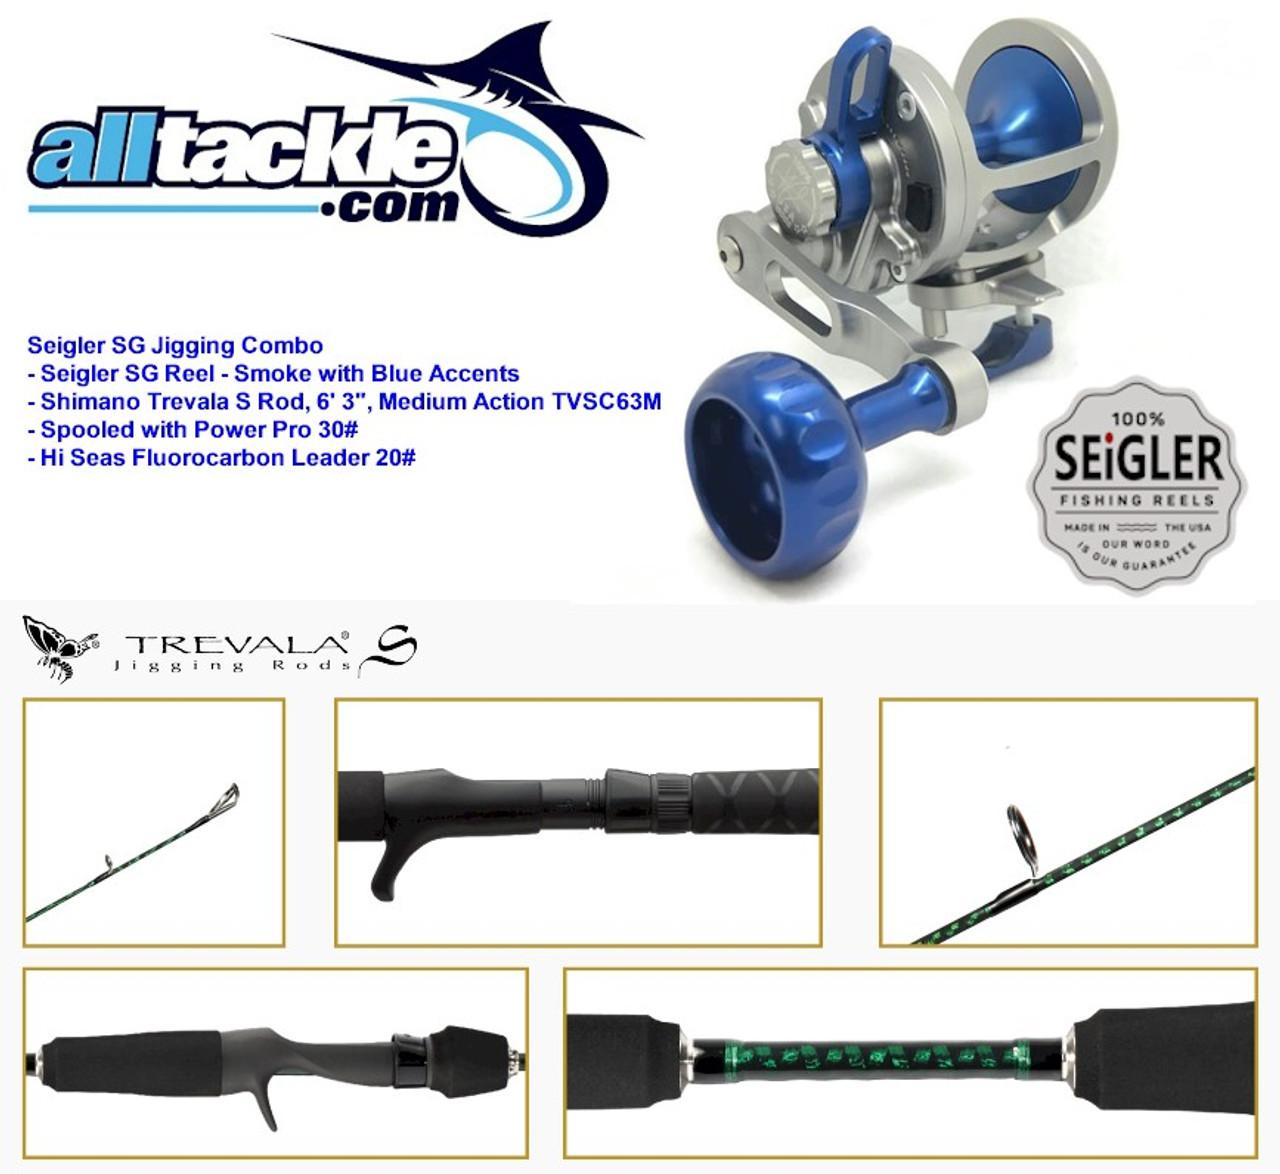 25627f41618 Seigler Combo - SG Reel with Shimano Trevala S Jigging Rod - Alltackle.com